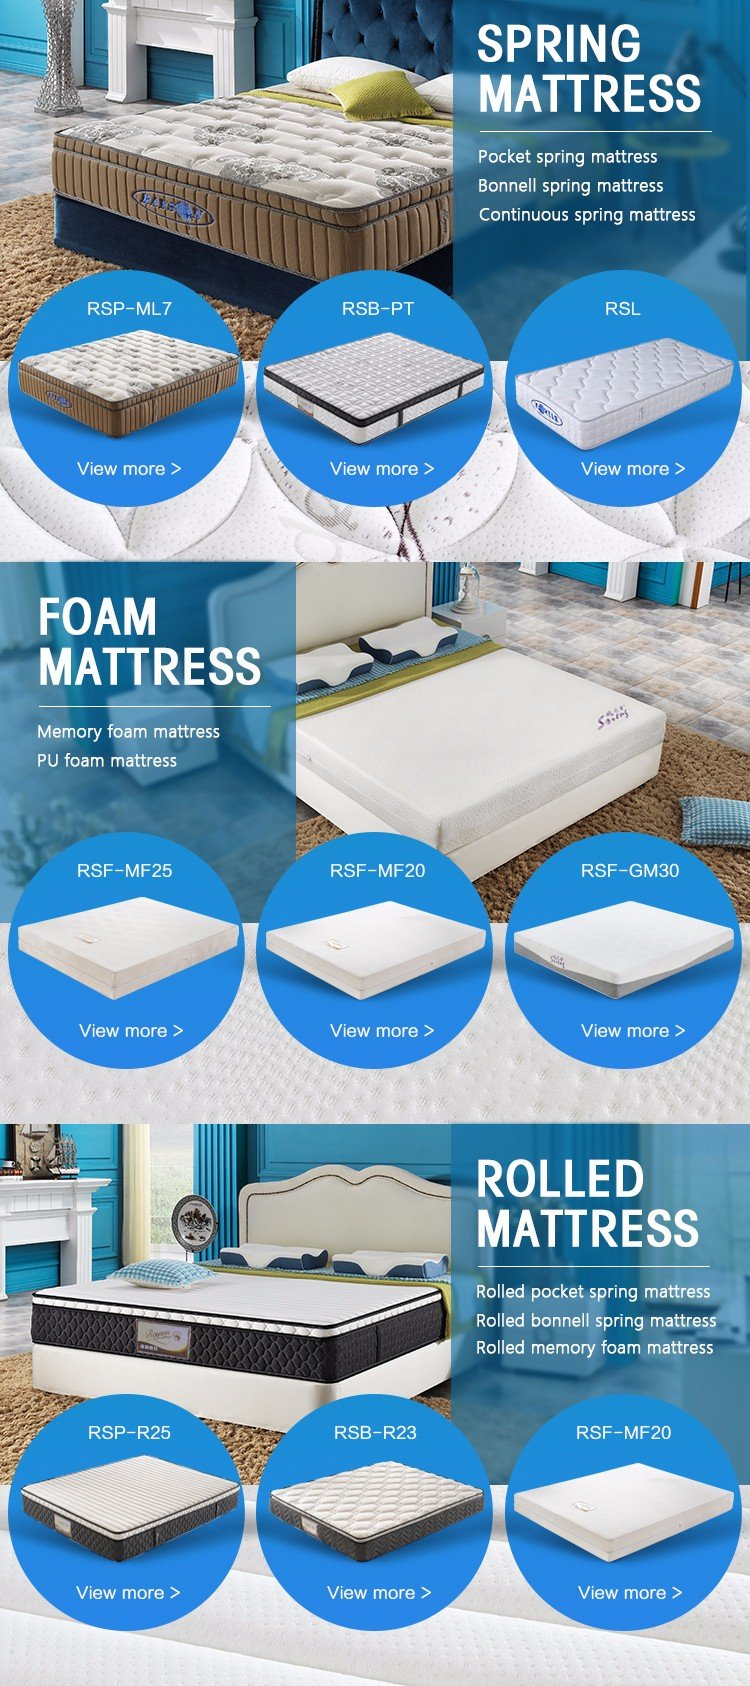 Rayson Mattress home zipped mattress protector Suppliers-7